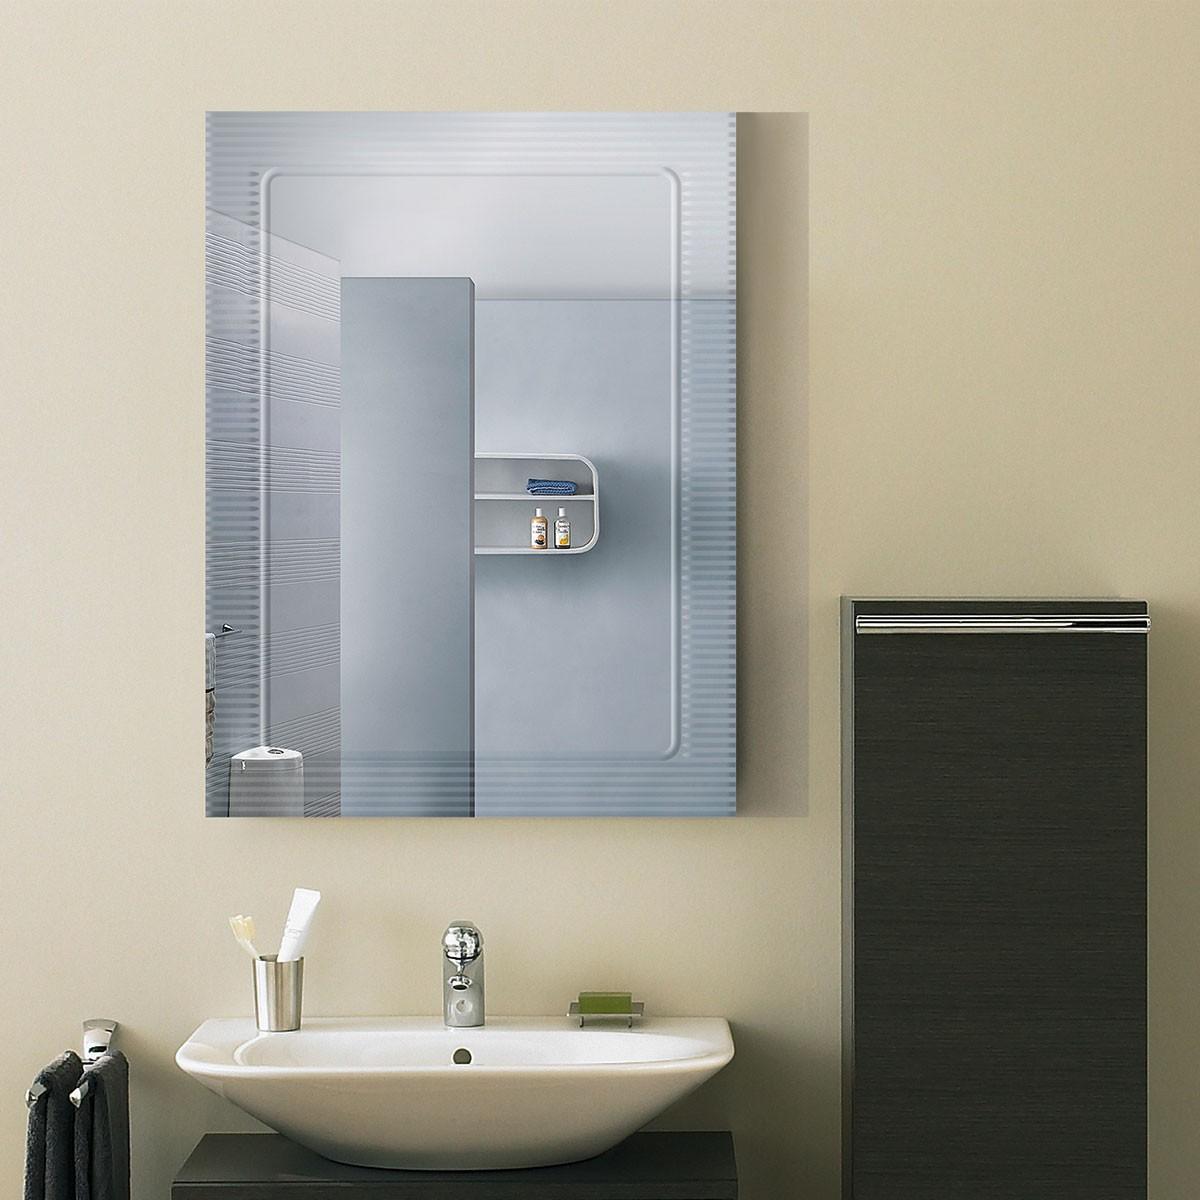 18 x 24 In. Wall-mounted Rectangle Bathroom Mirror (DK-OD-B067C)